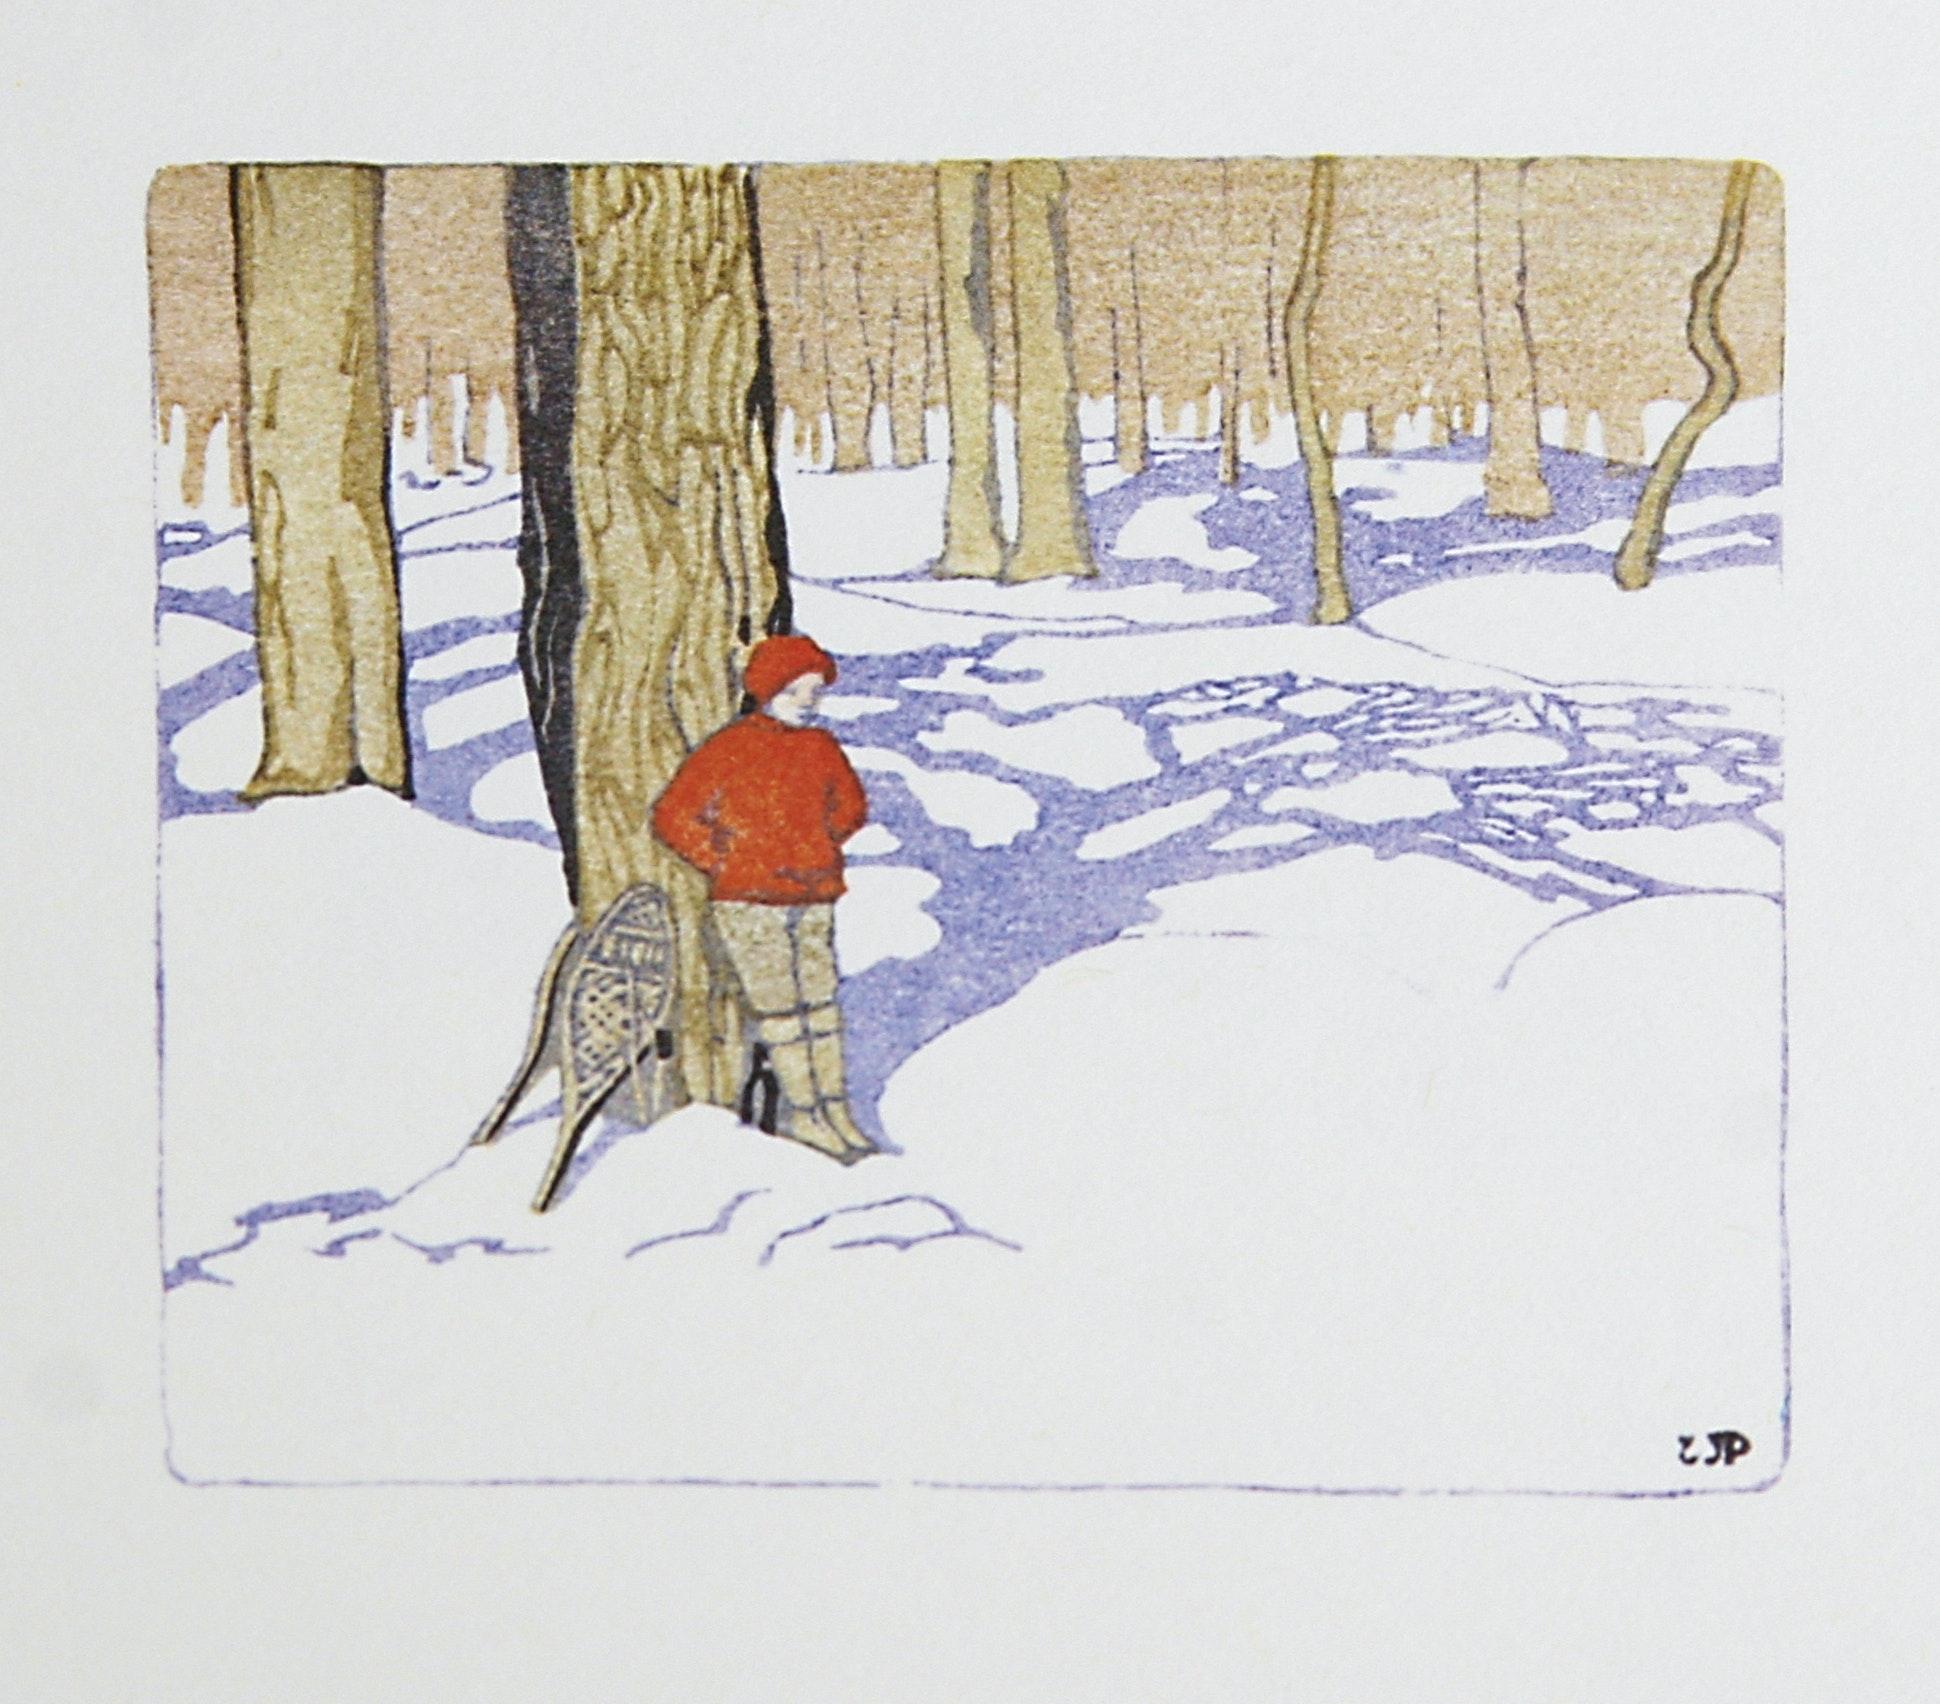 Winter Woods by WJ Phillips